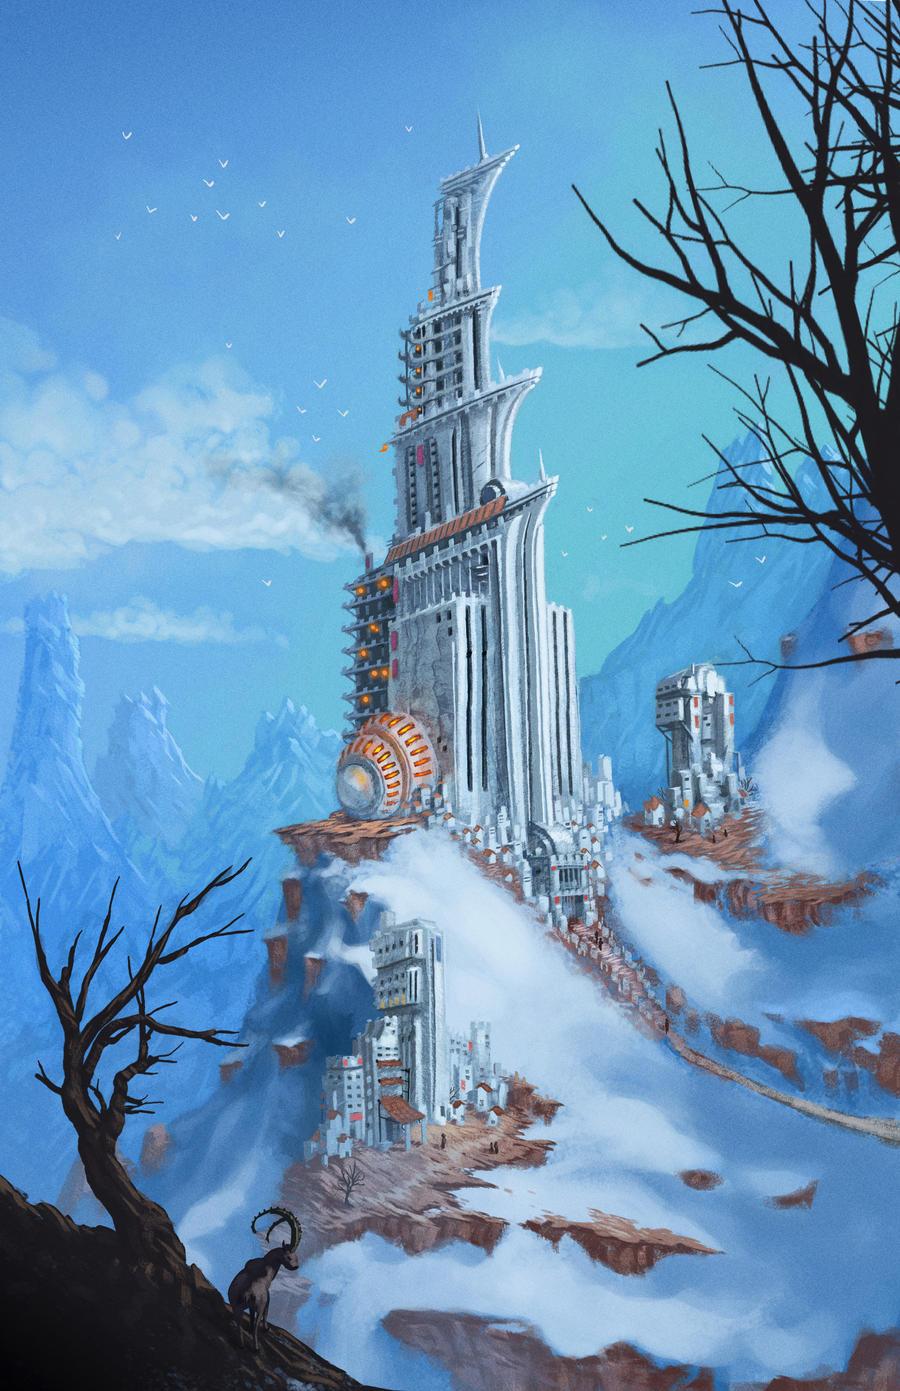 Winter Fortress by DigitalCutti